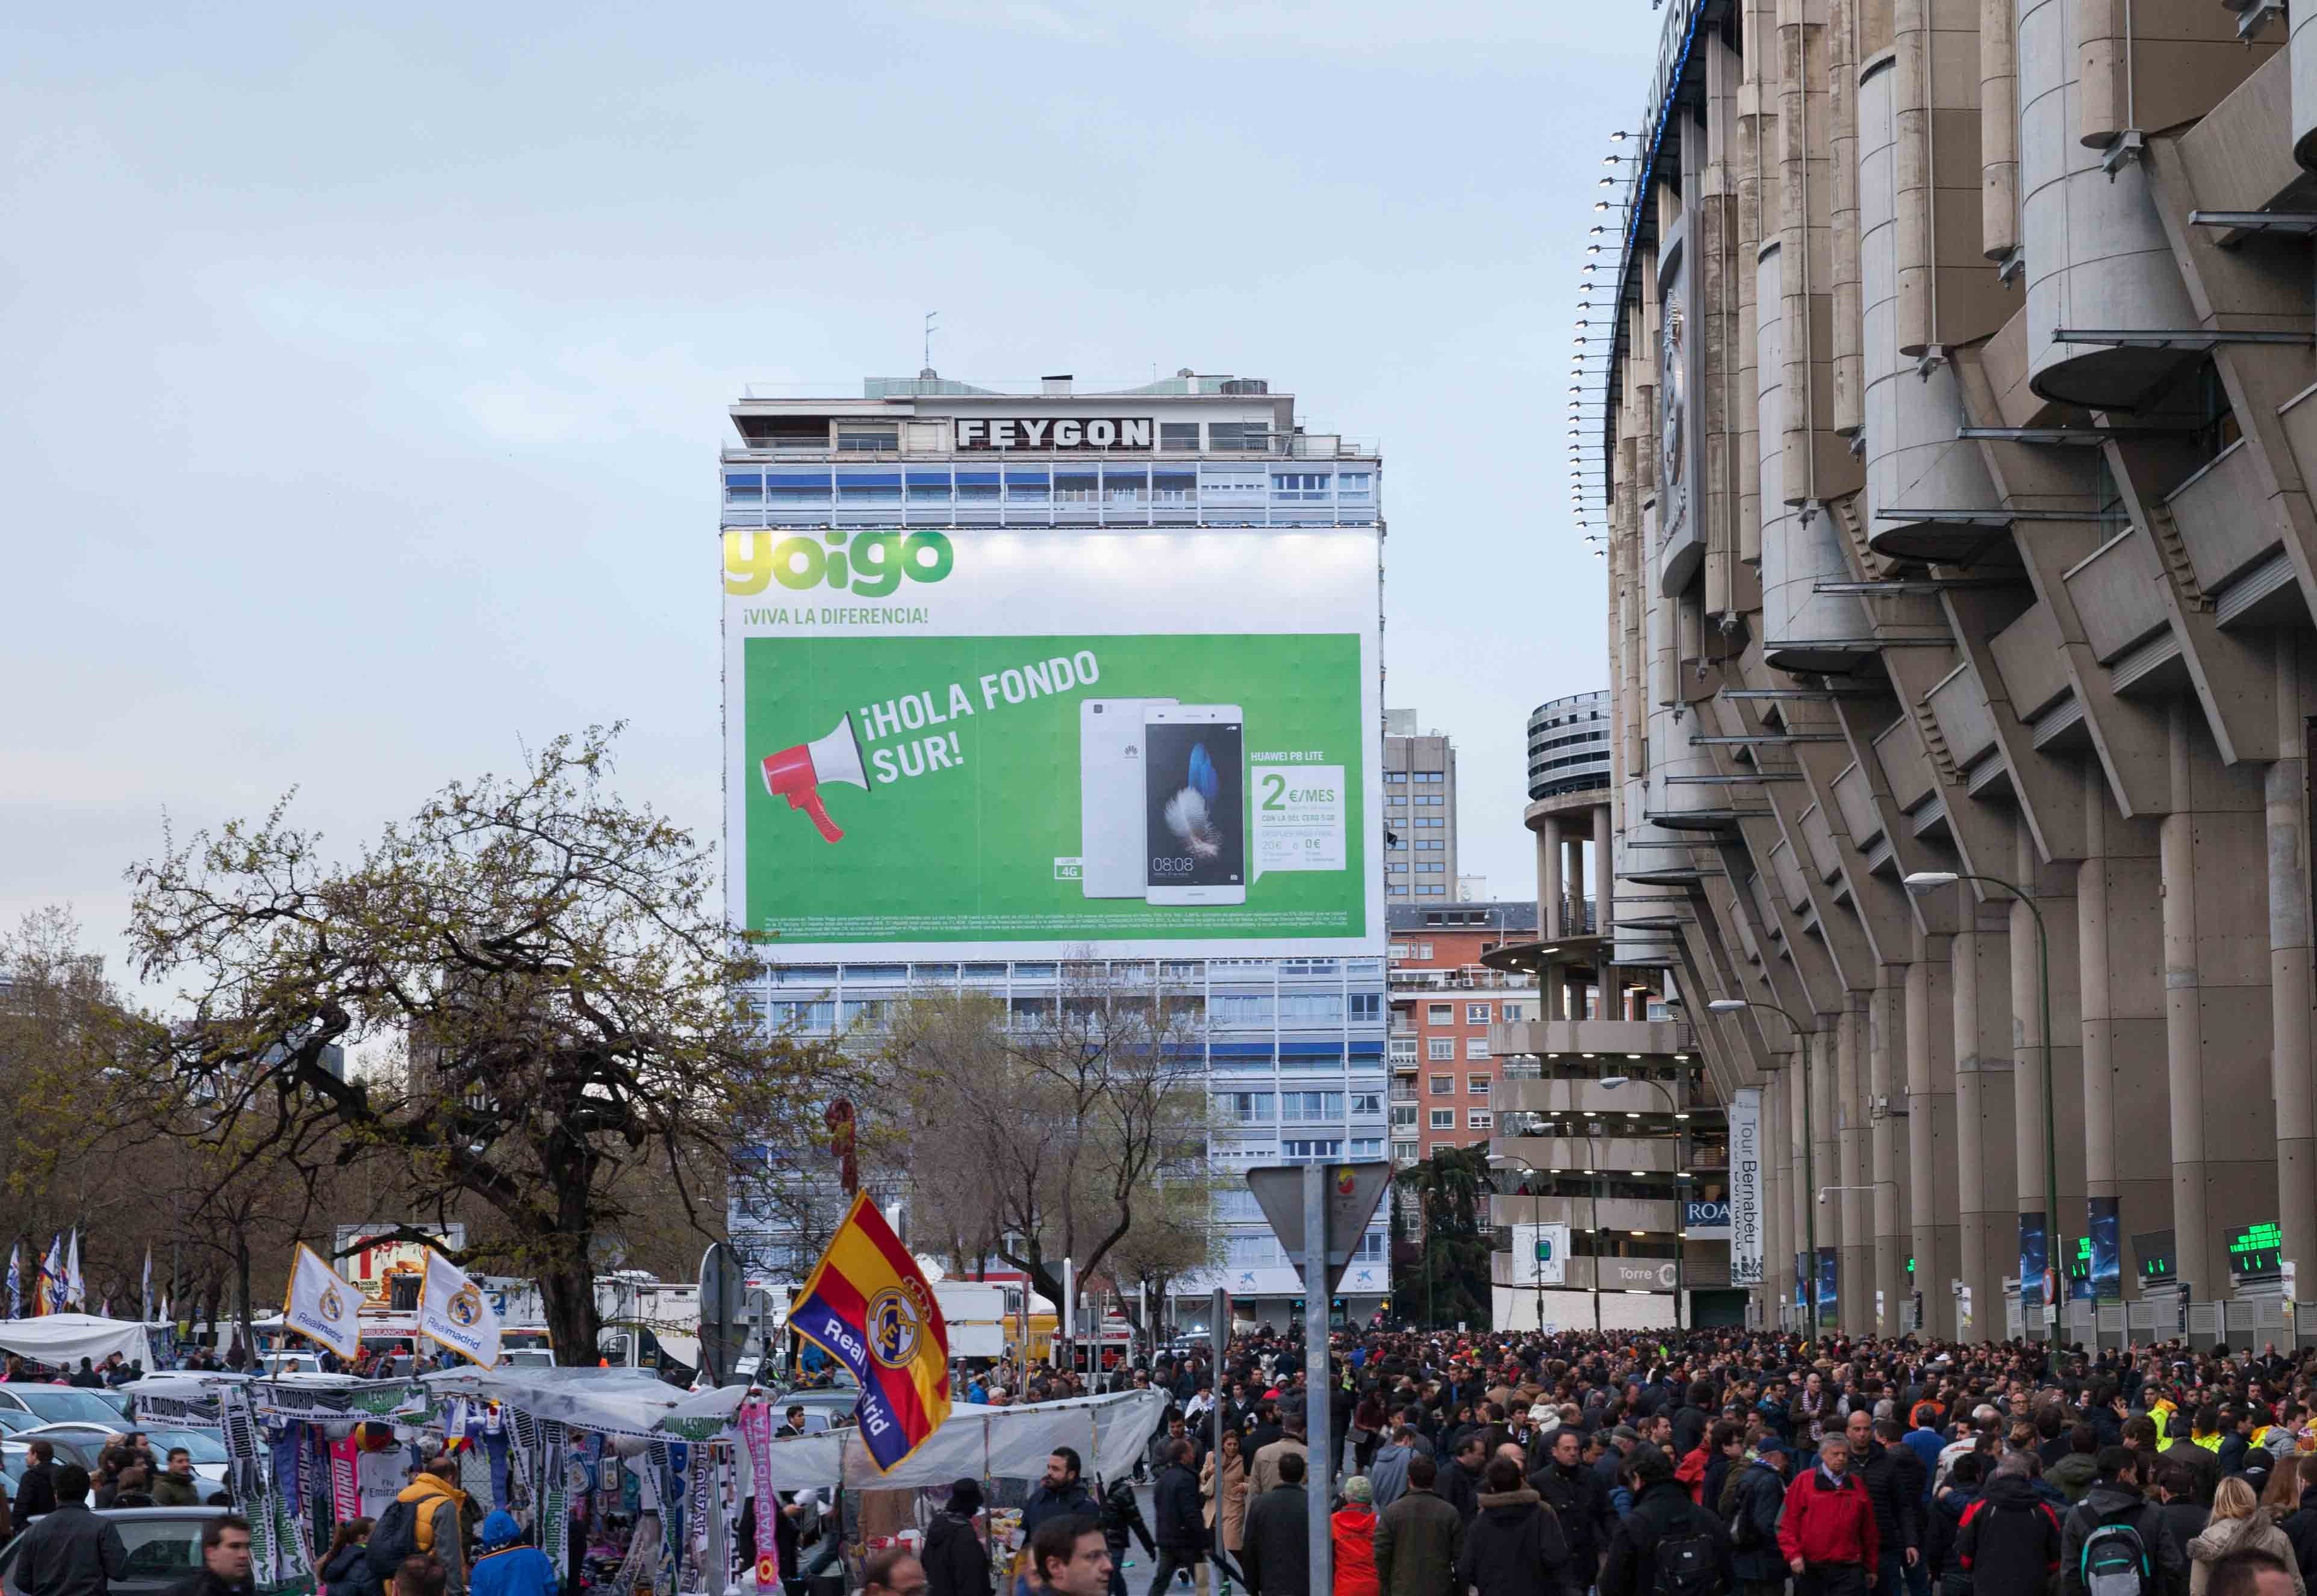 lona-publicitaria-madrid-paseo-castellana-144-feygon-sur-yoigo-bernabeu-vsa-comunicacion